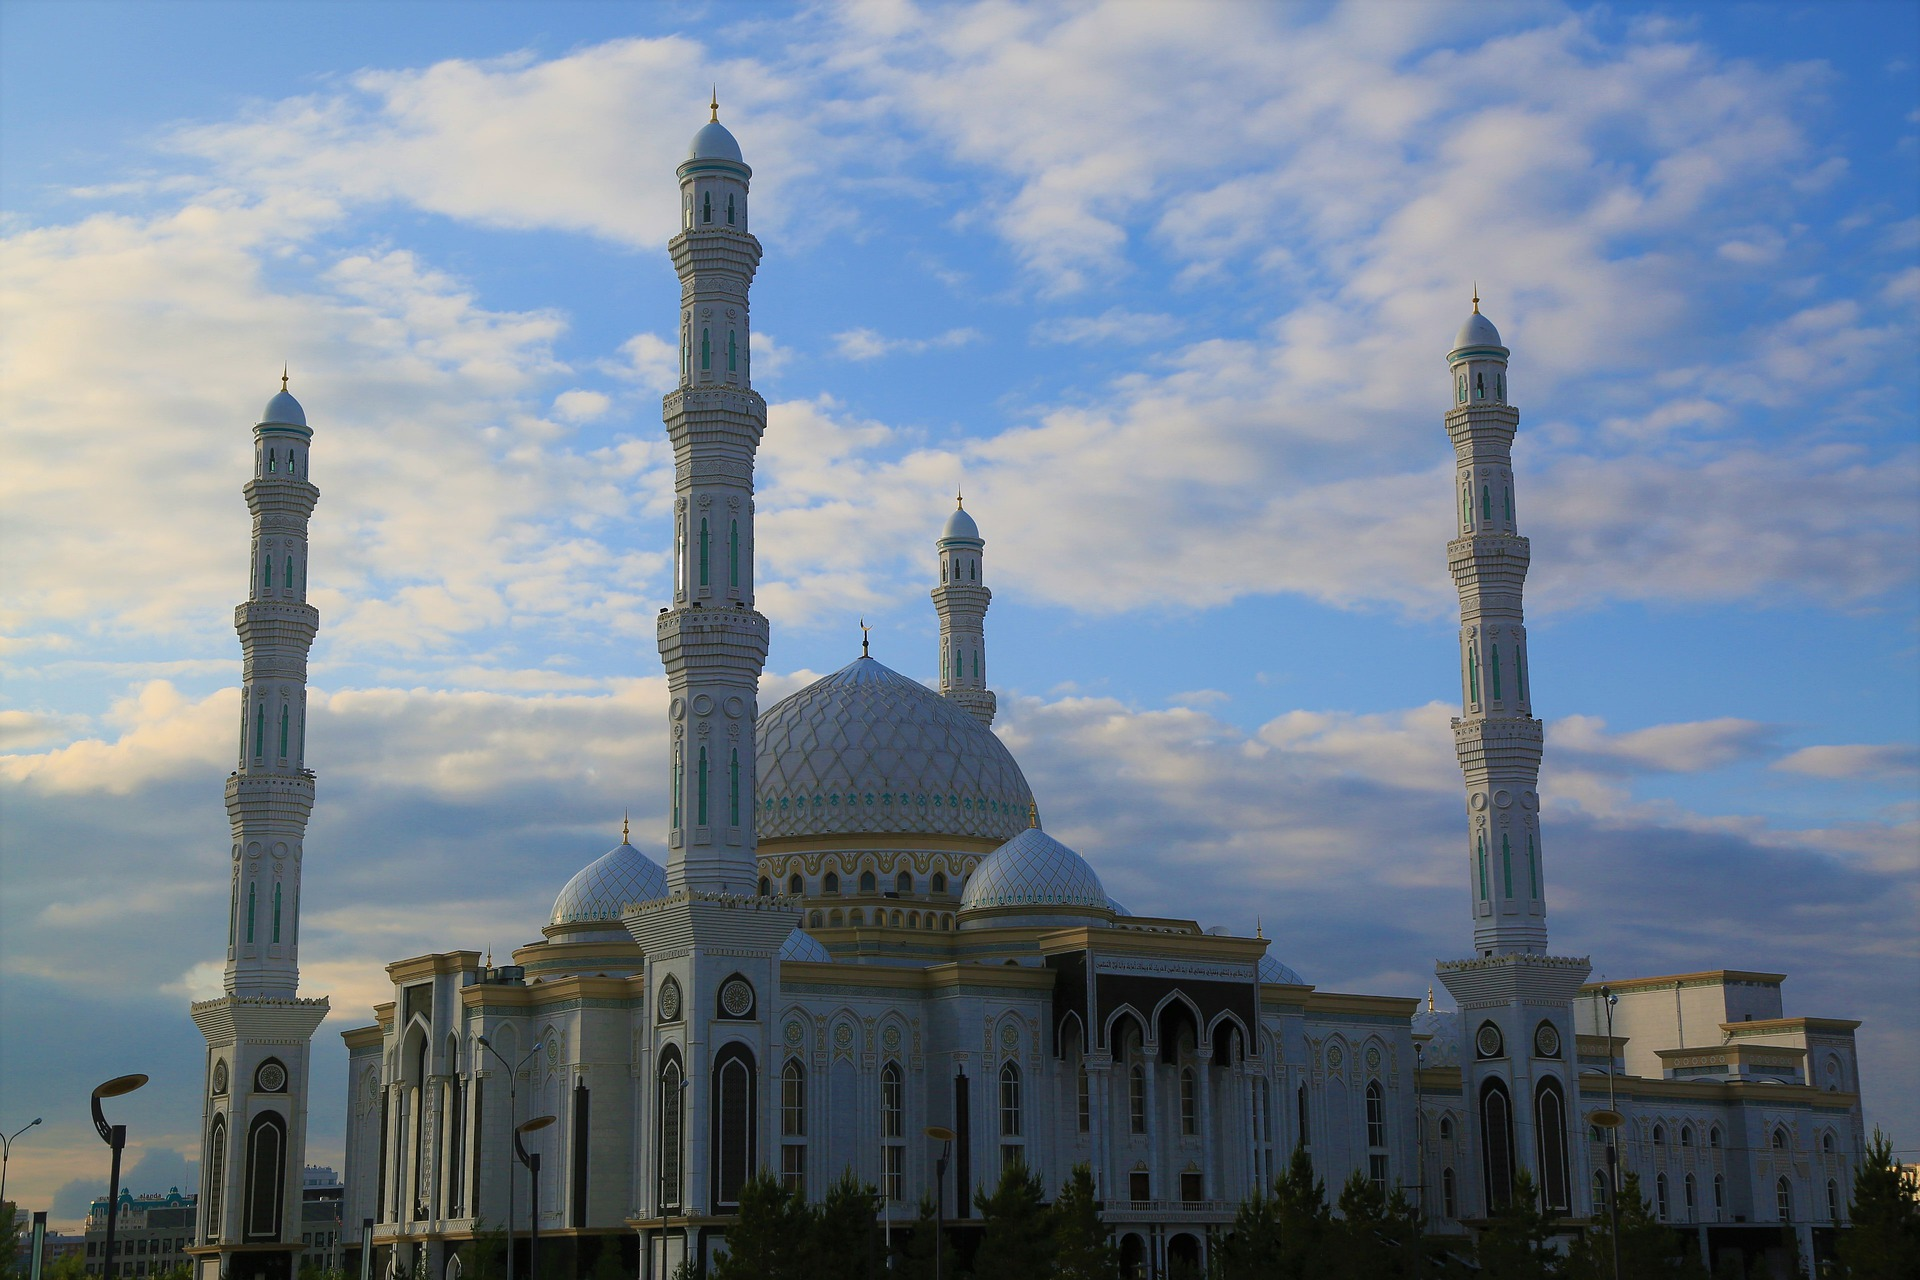 Mosque, Kazakhstan